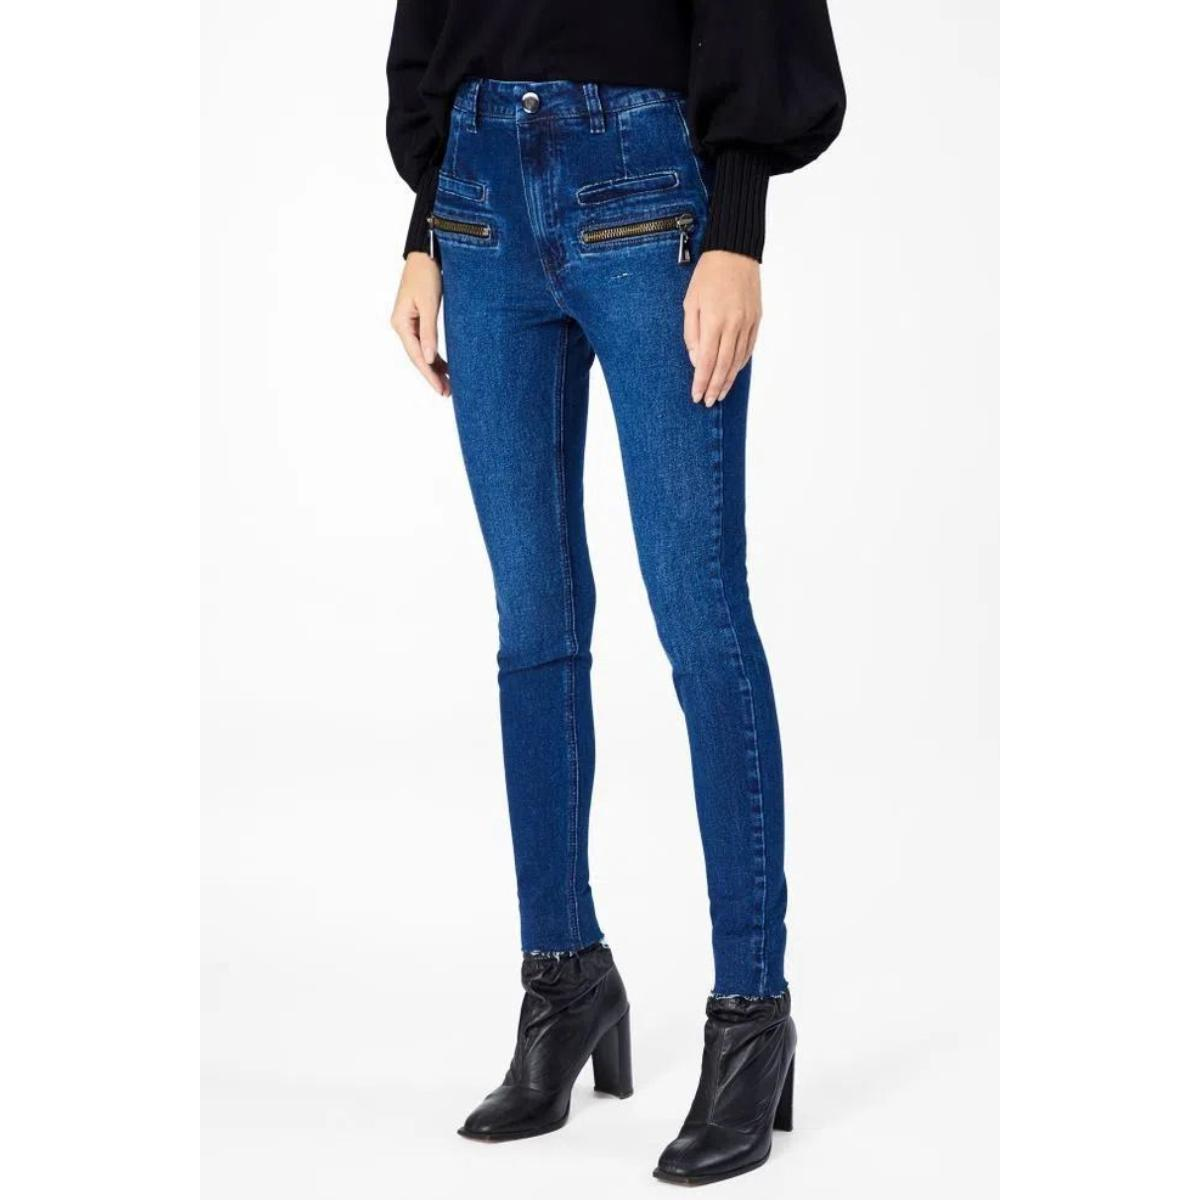 Calça Feminina Animale 04.69.1786 Jeans Escuro